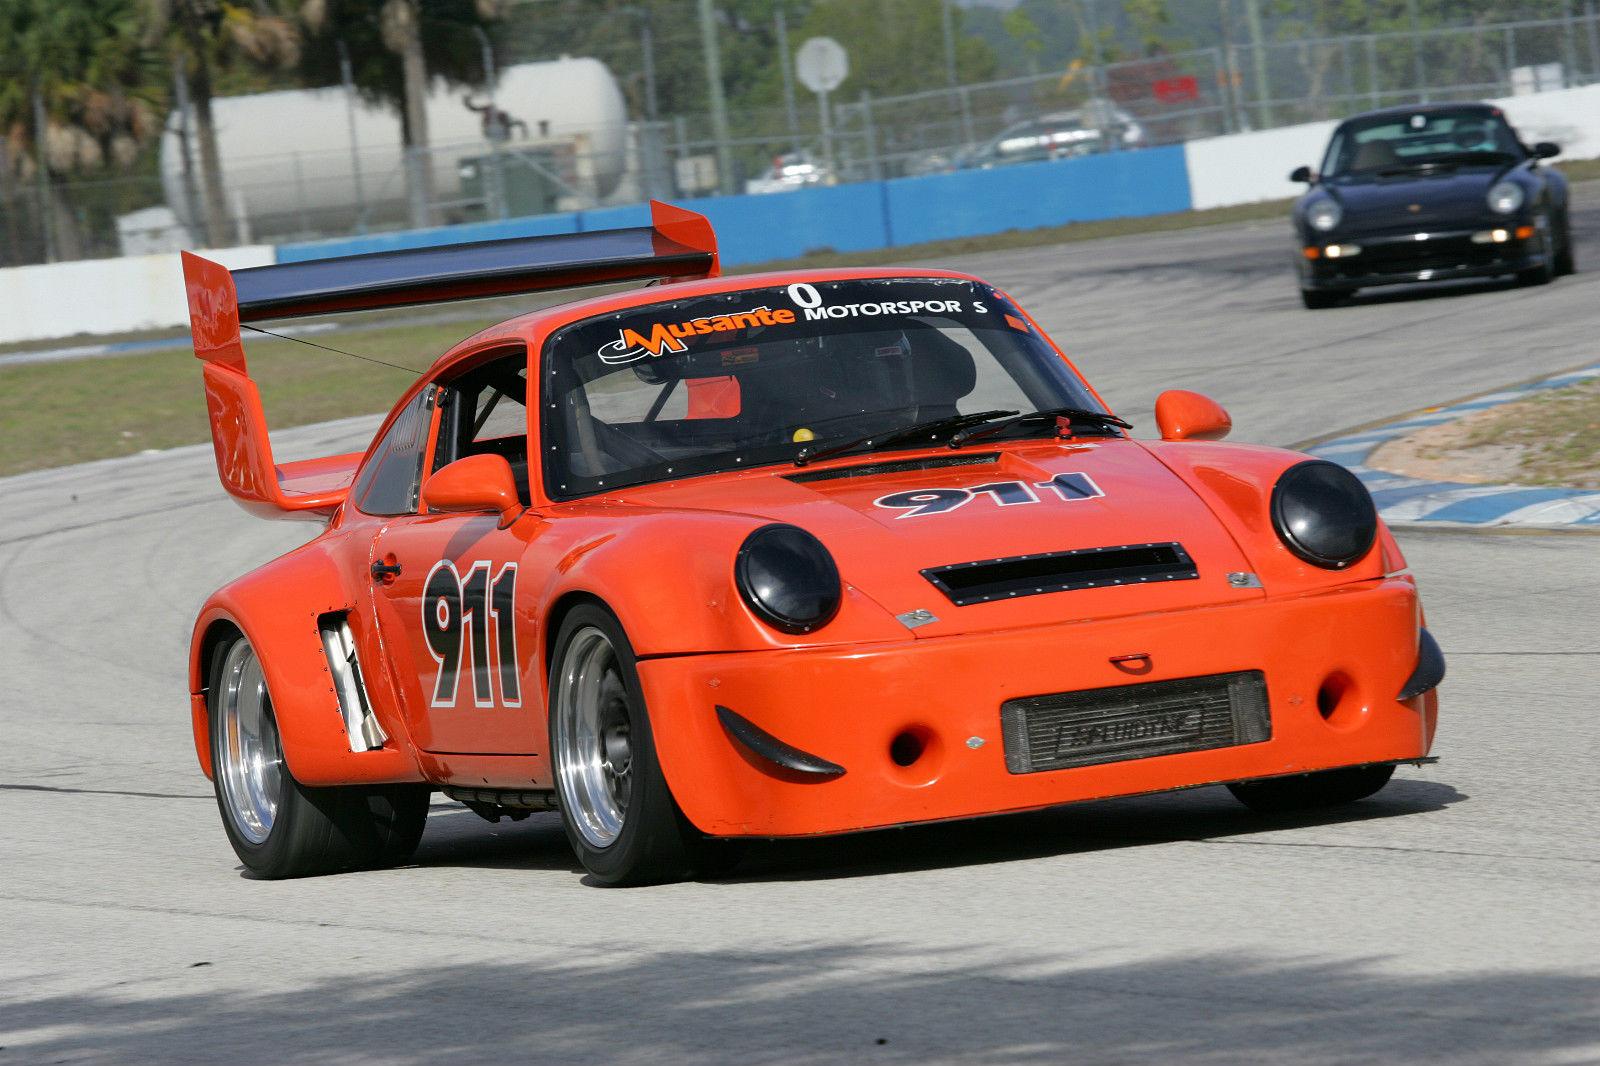 1976 Porsche 911 Rsr Race Car Classic Porsche 911 1976